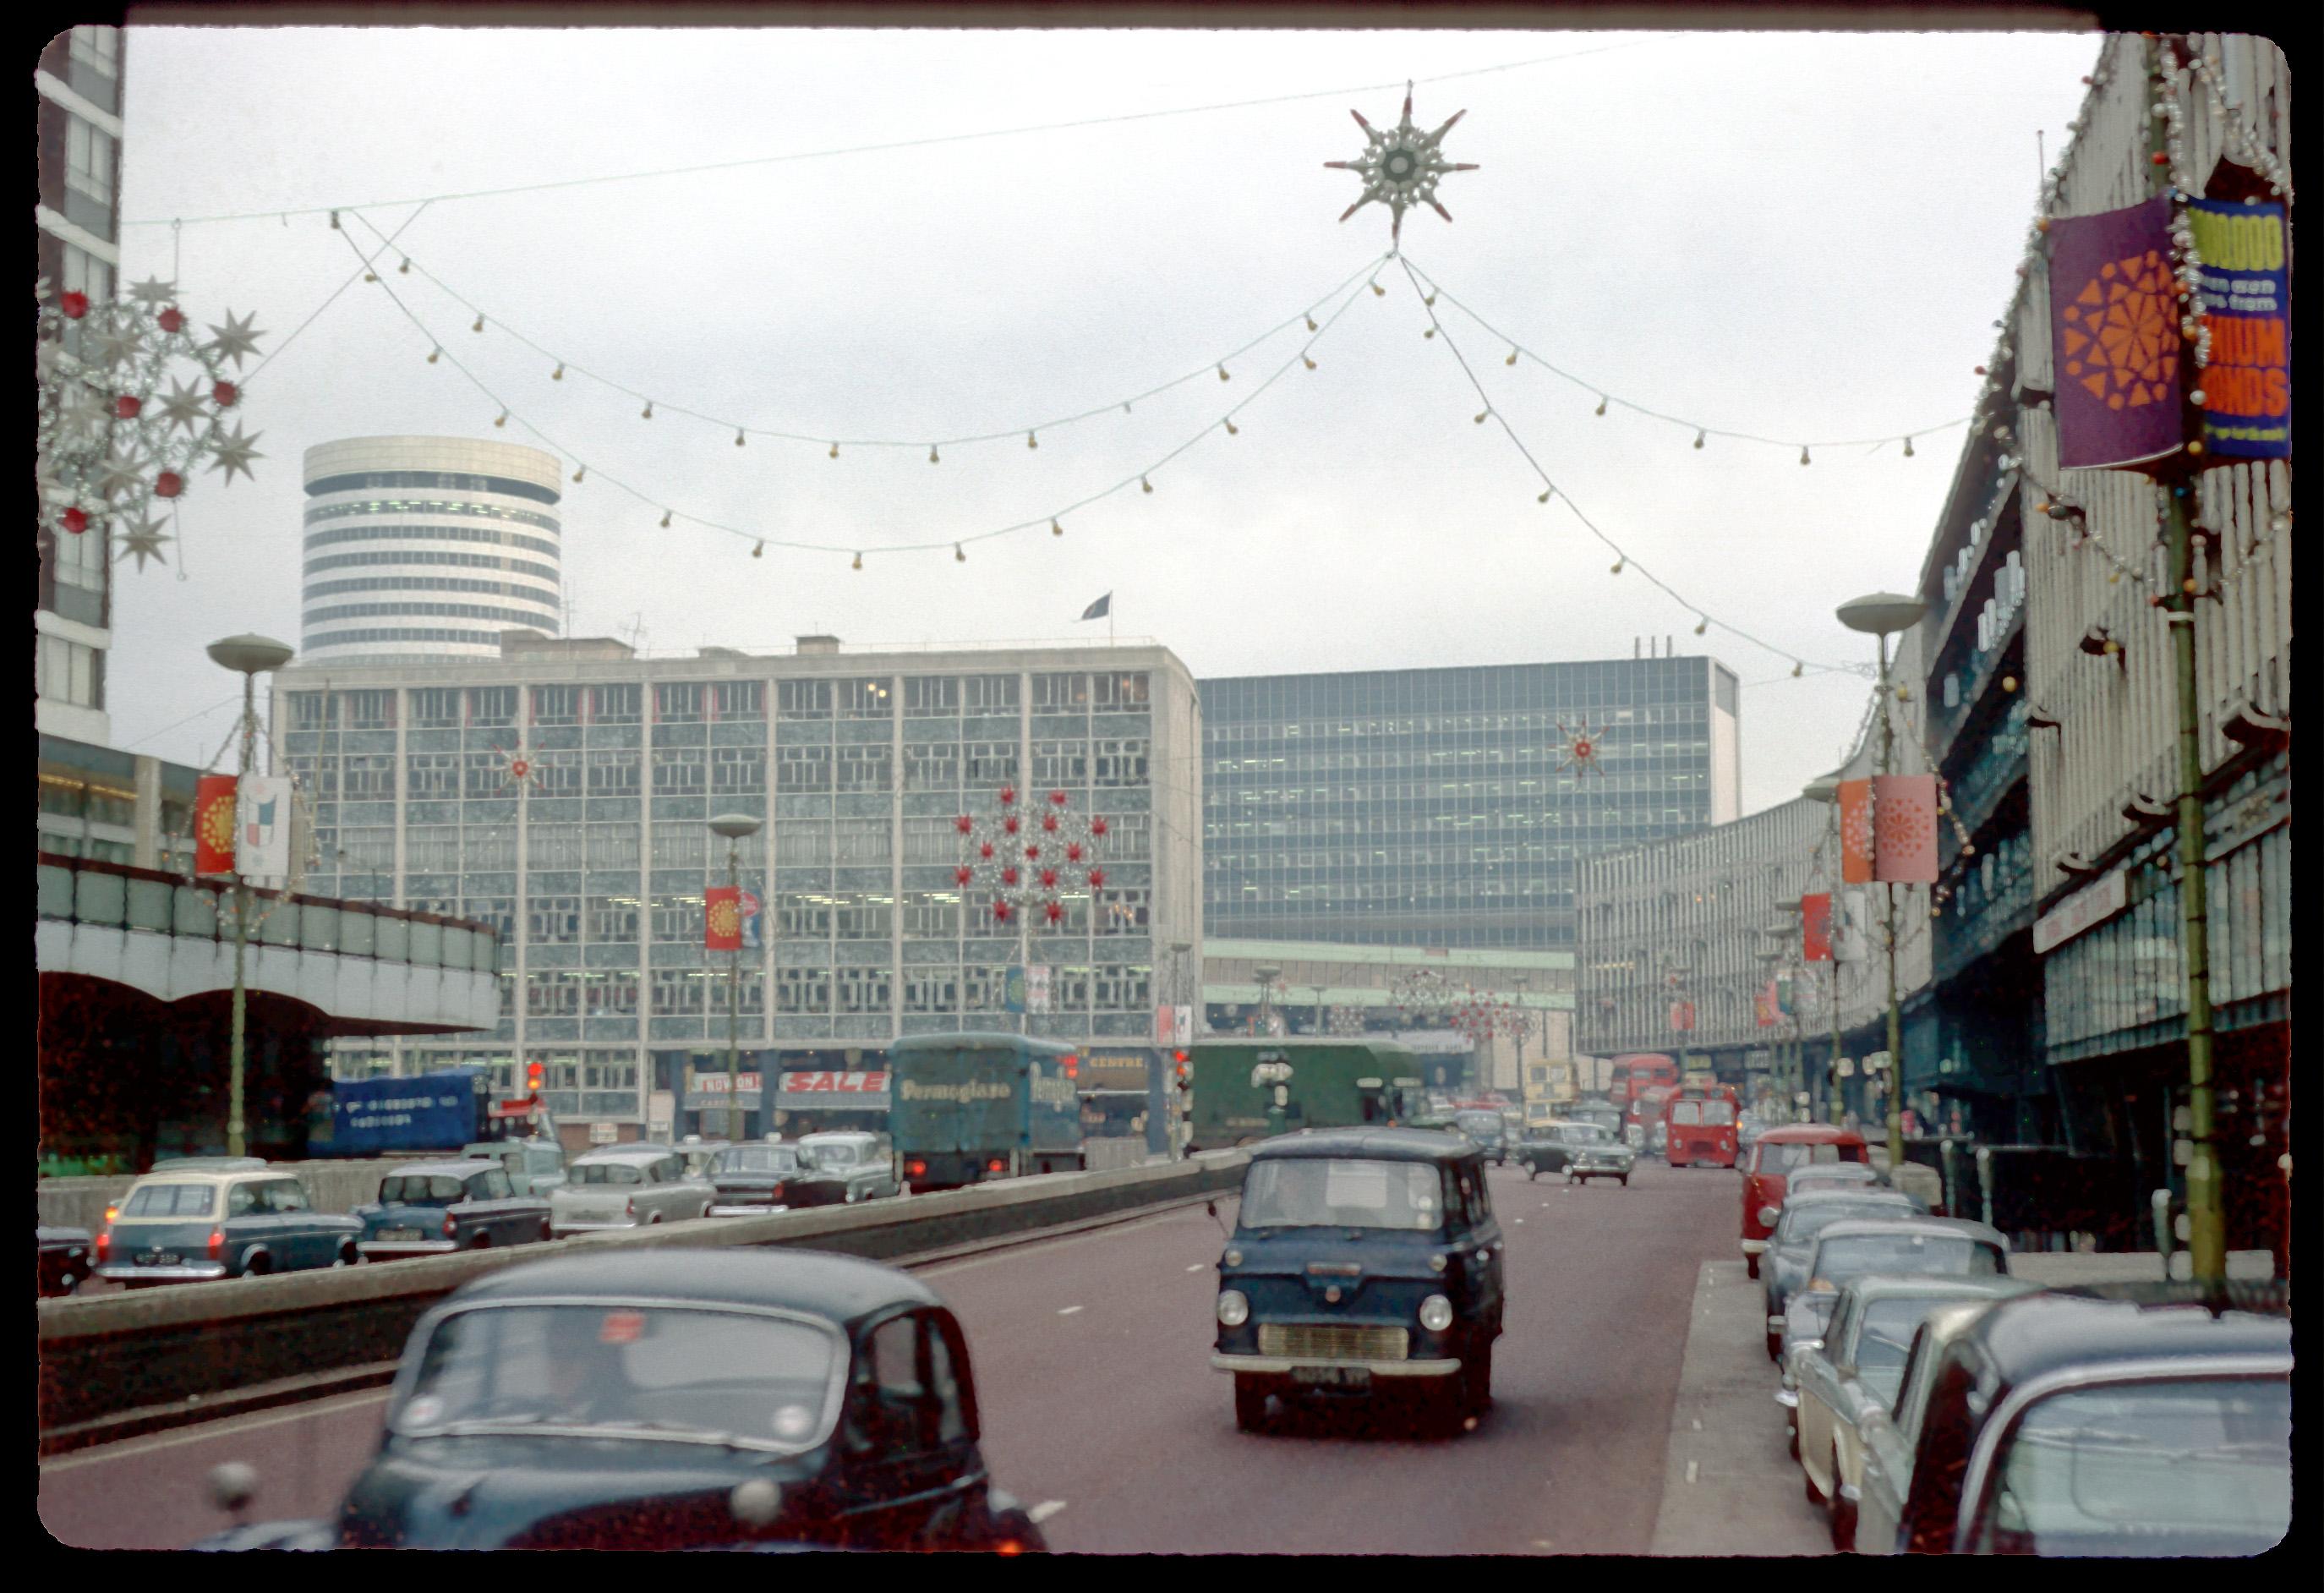 Birmingham Christmas Lights.Smallbrook Ringway With Christmas Lights Birmingham